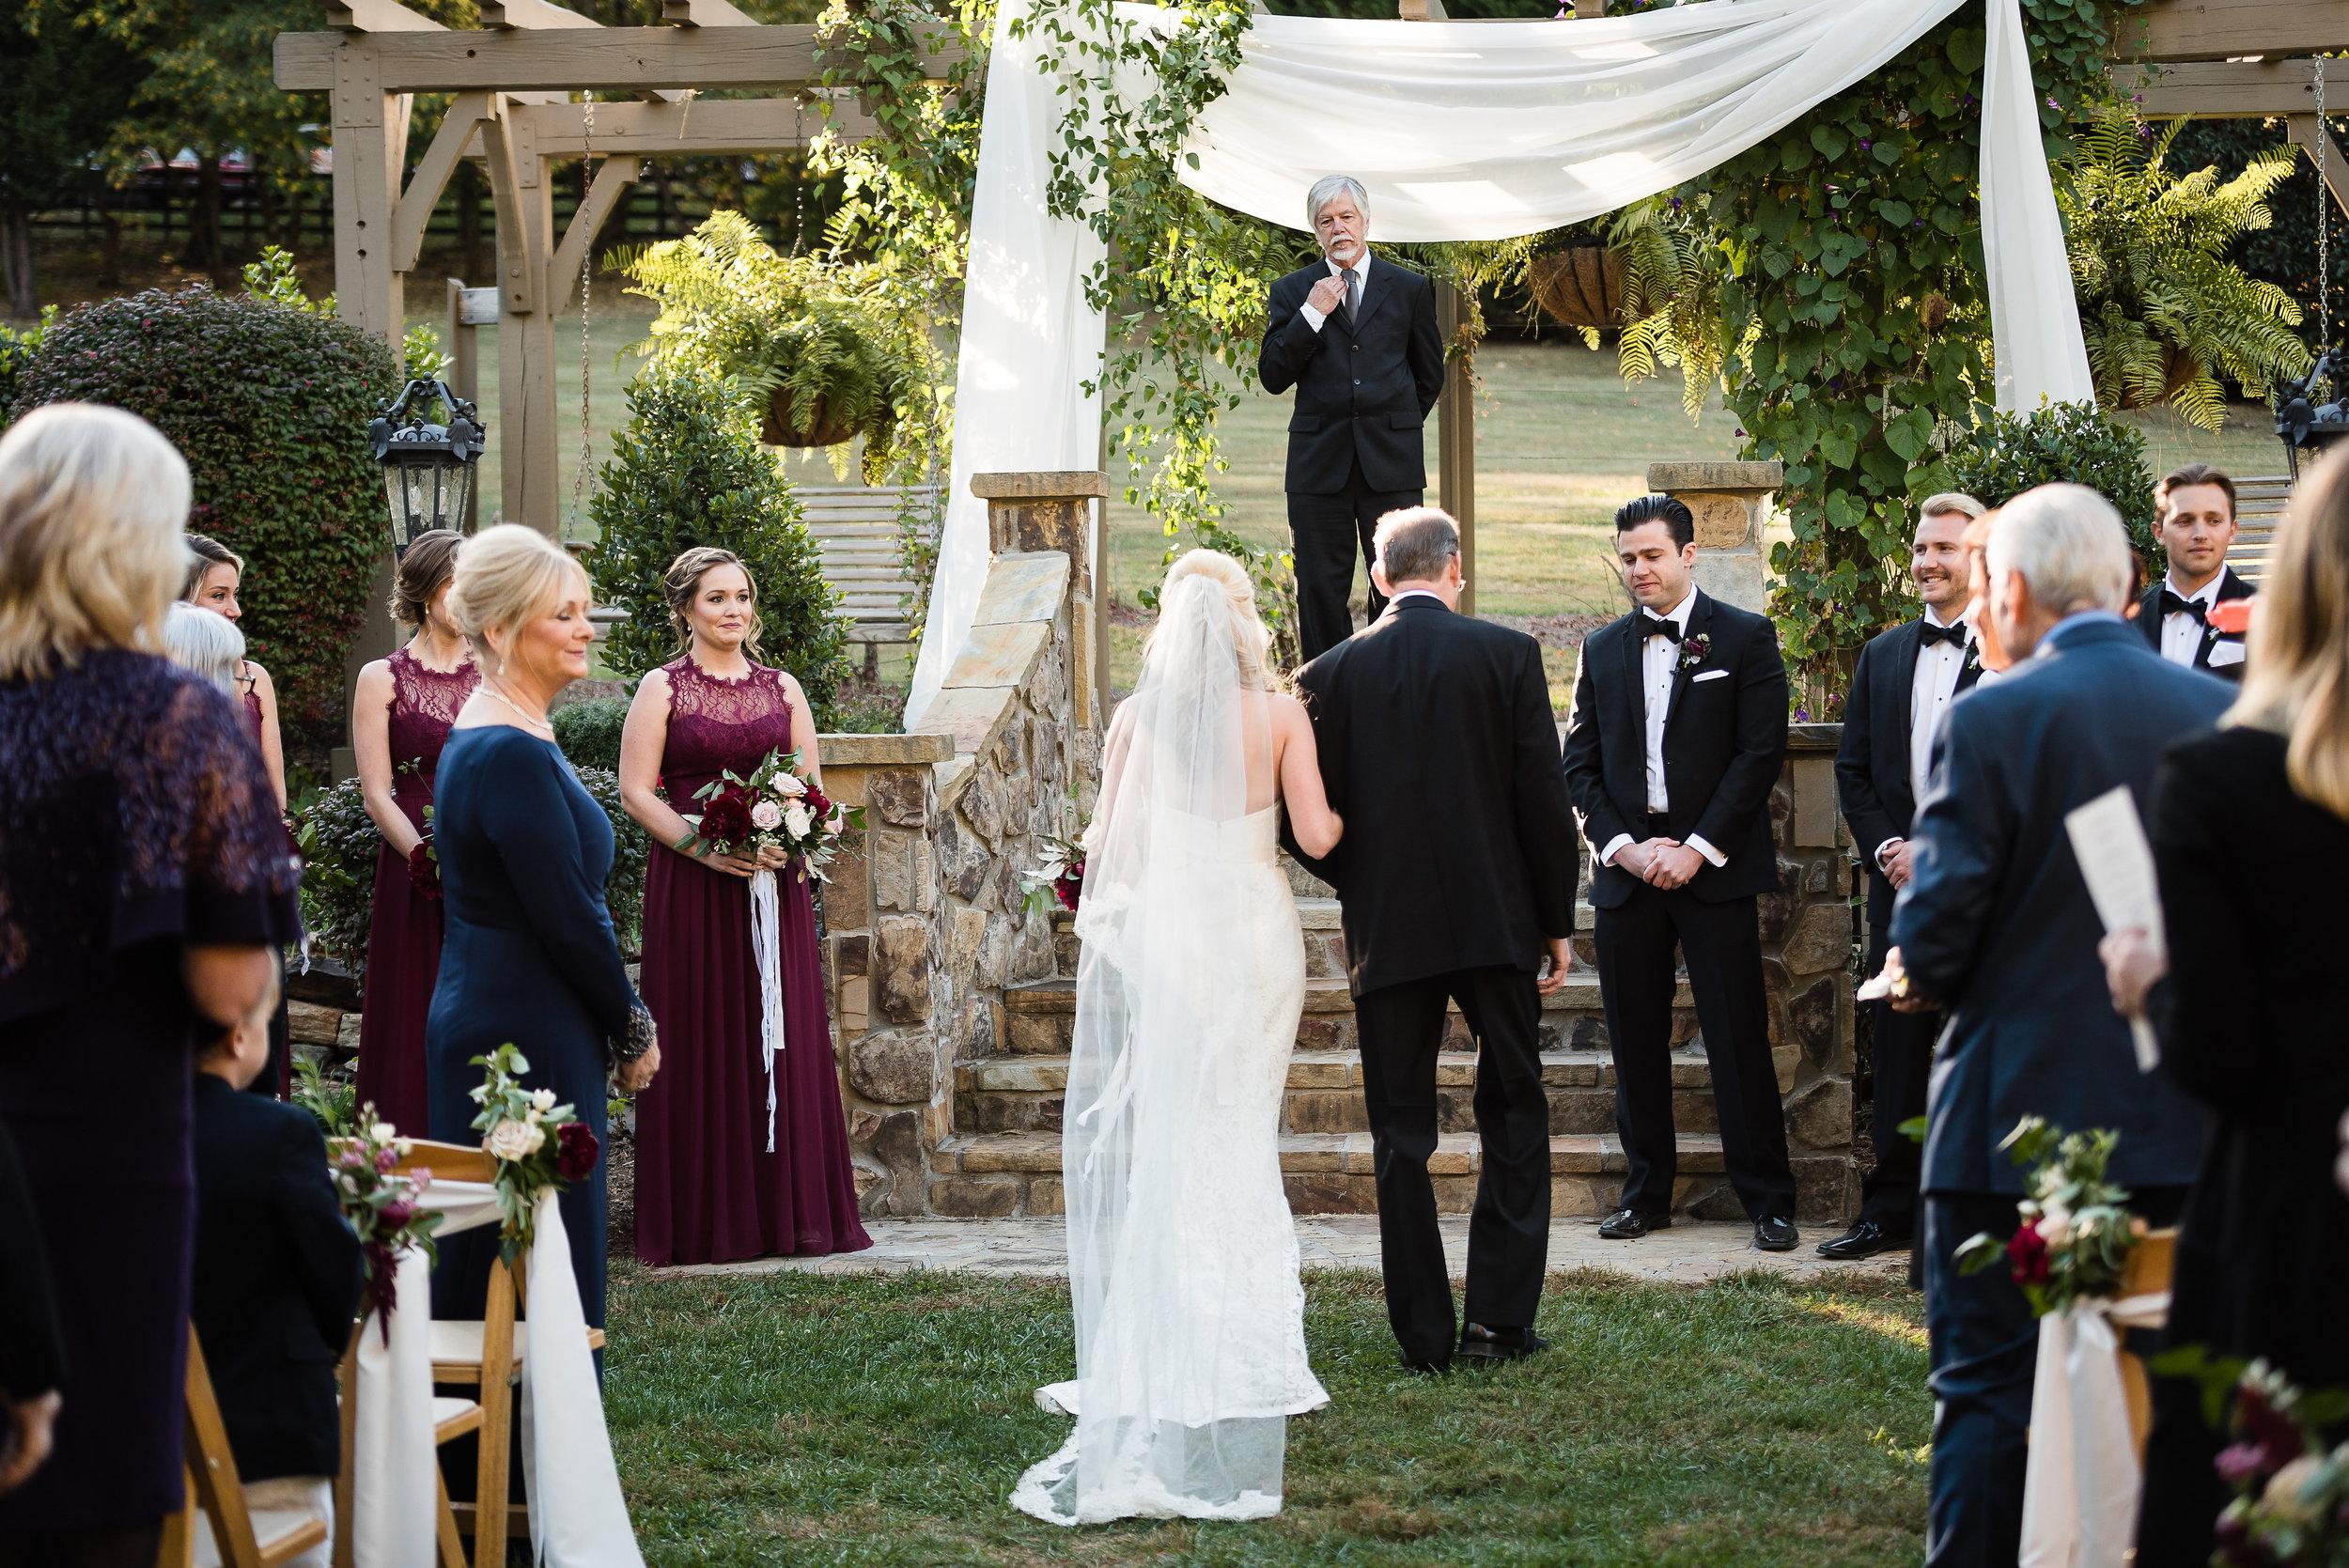 20161022_hawkesdene_fall_wedding_photos_0889.jpg